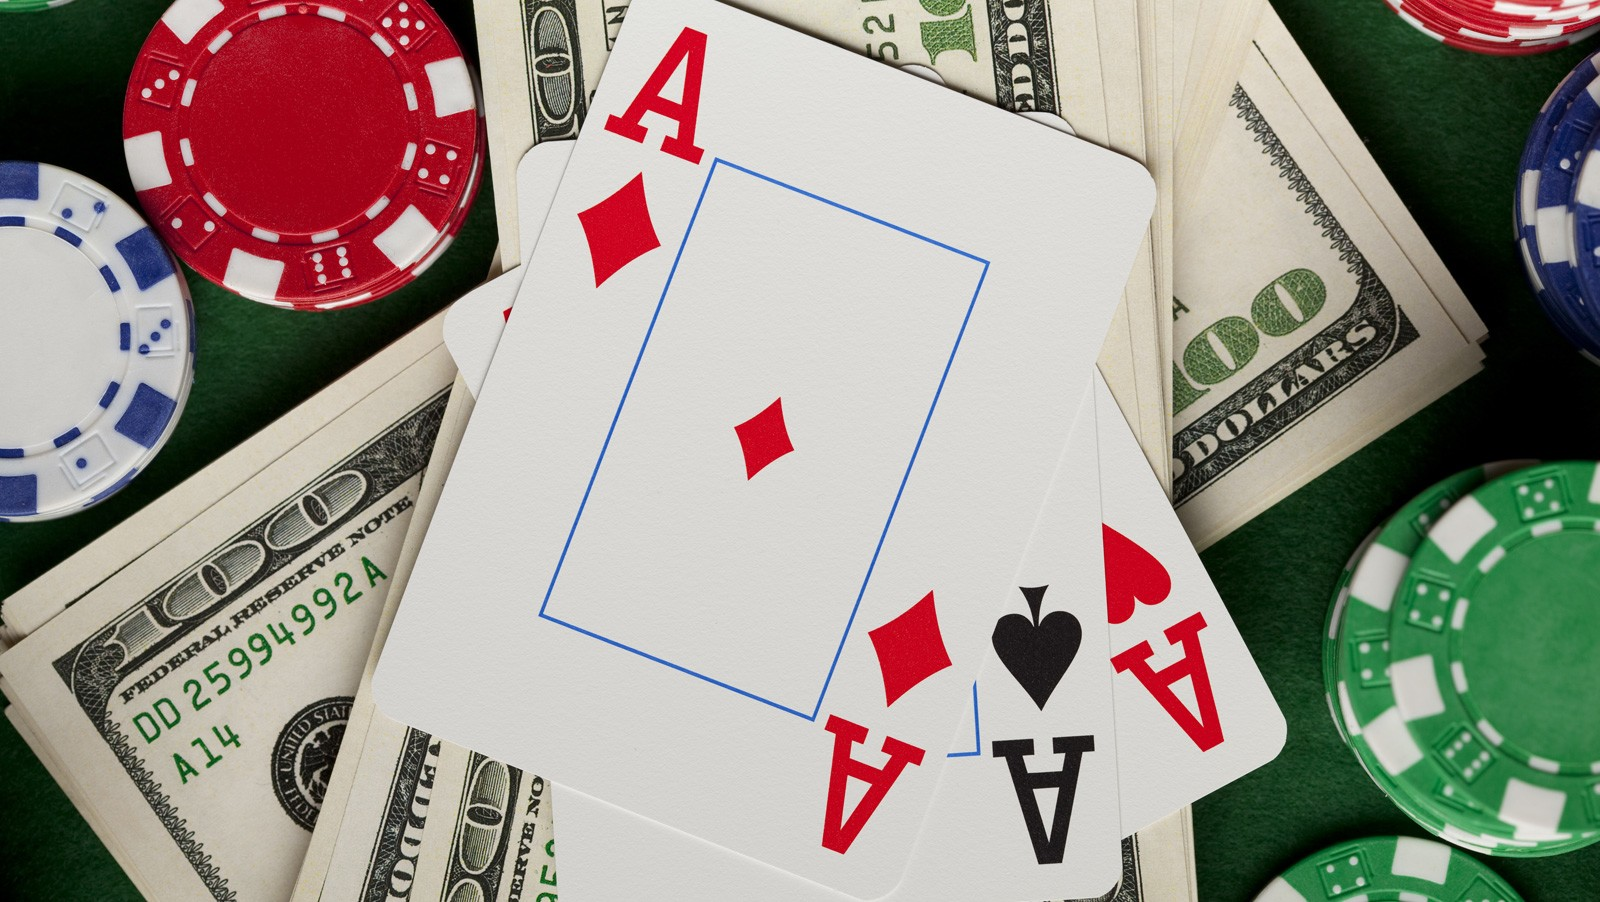 Pennsylvania postponing roll-out of online casinos